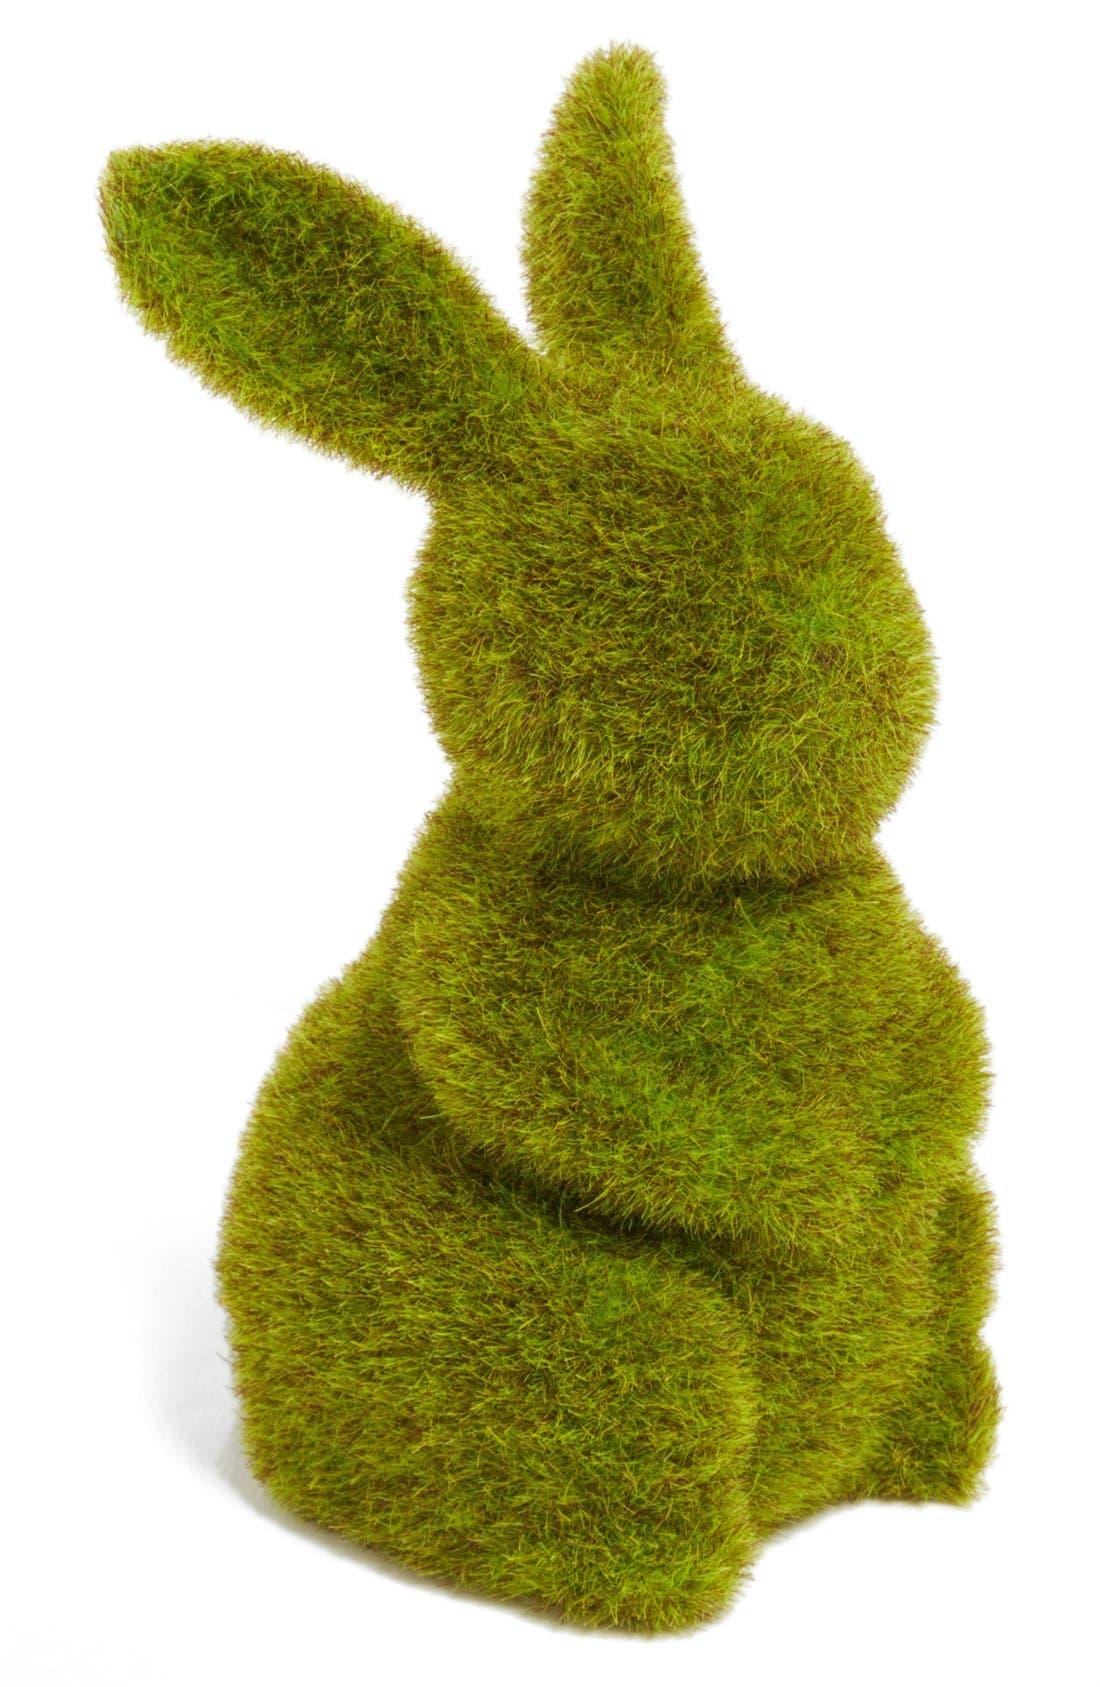 ALLSTATE 'Moss Bunny' Figurine